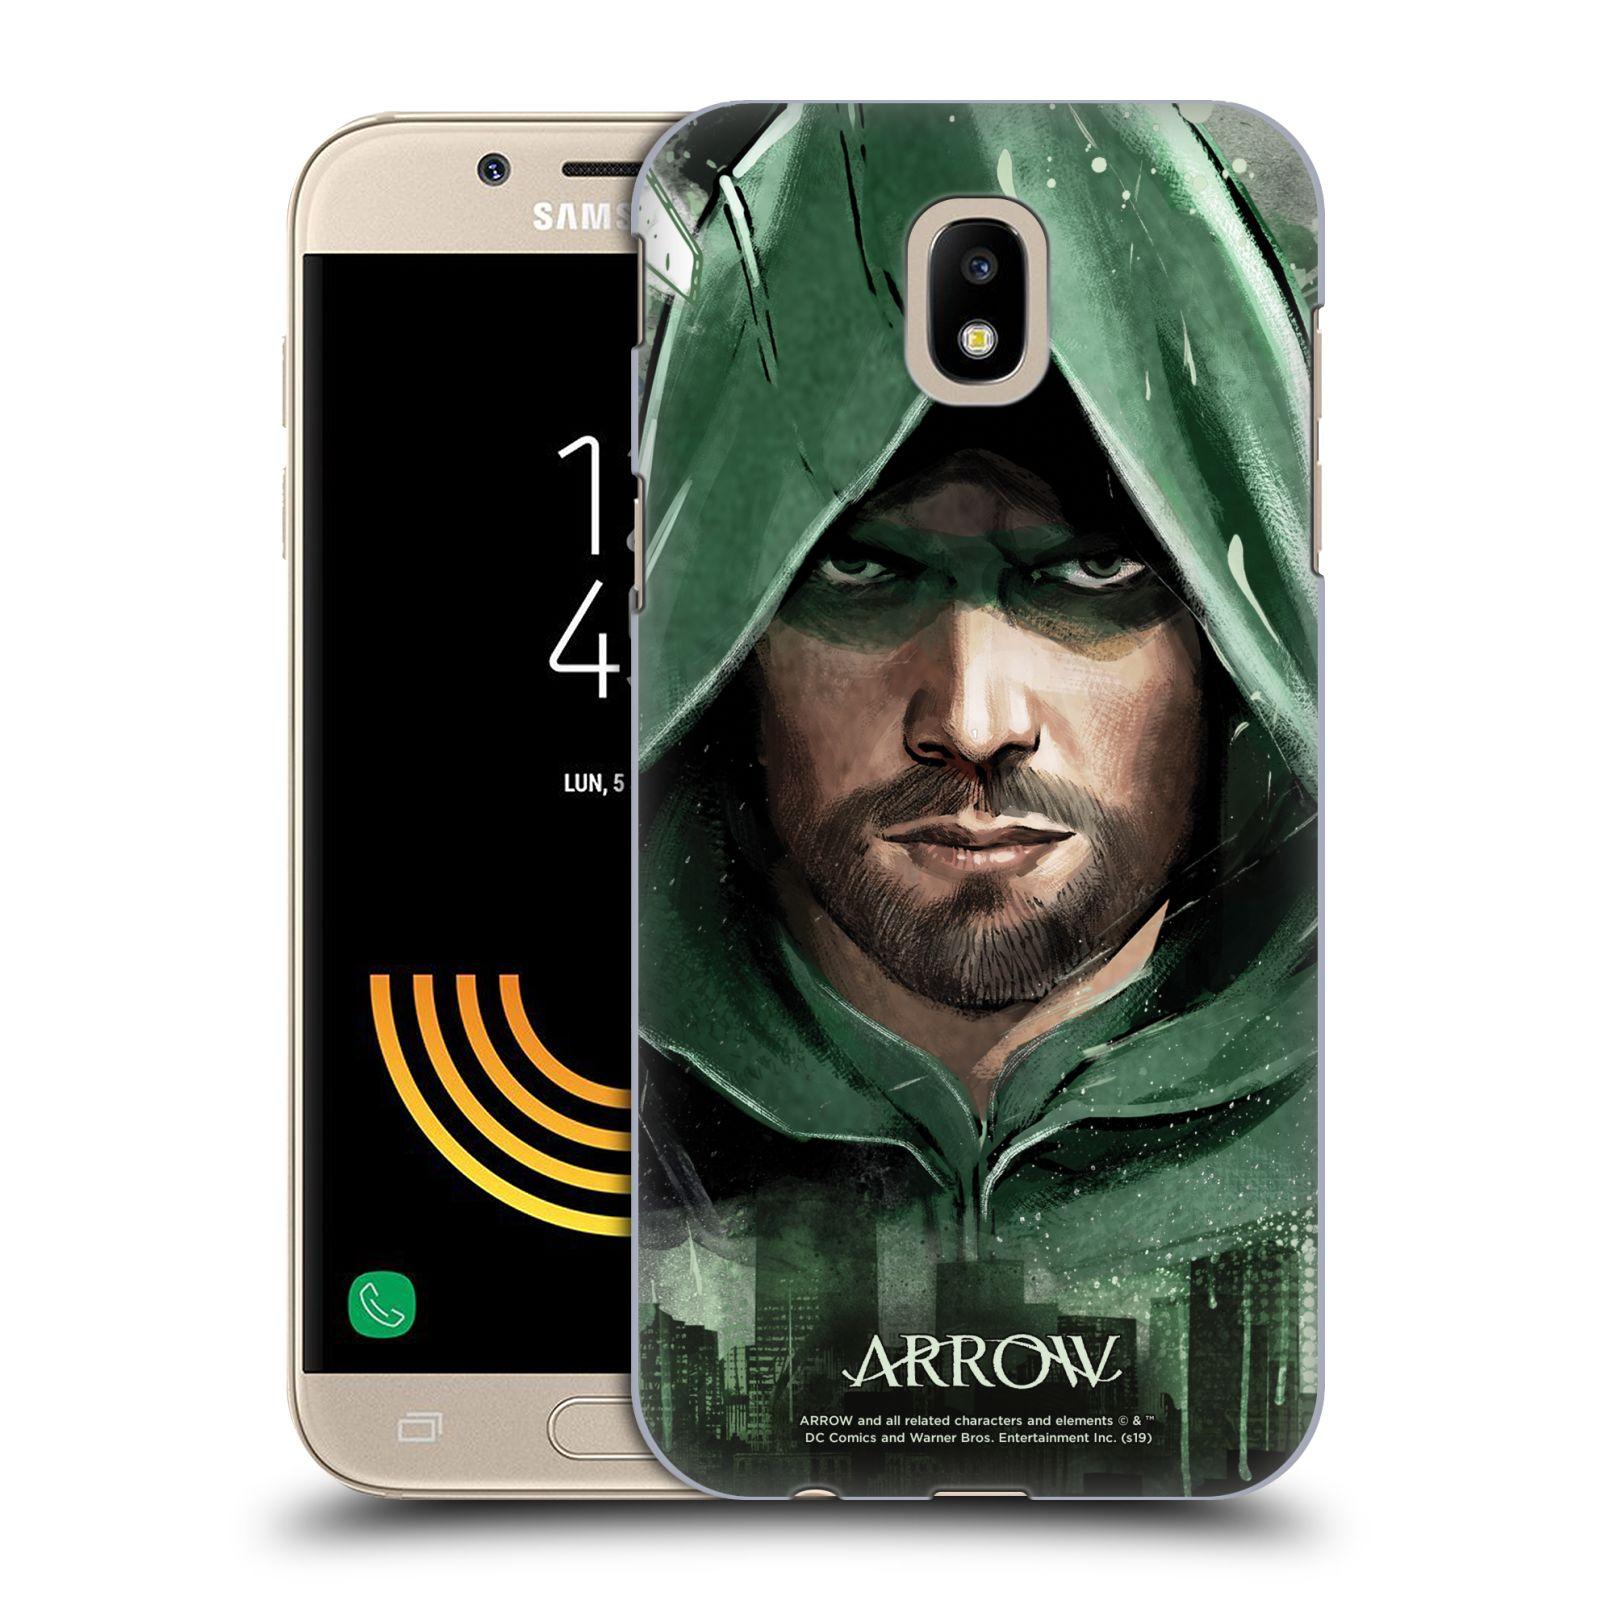 Pouzdro na mobil Samsung Galaxy J5 2017 - HEAD CASE - Seriál Arrow - kreslený motiv